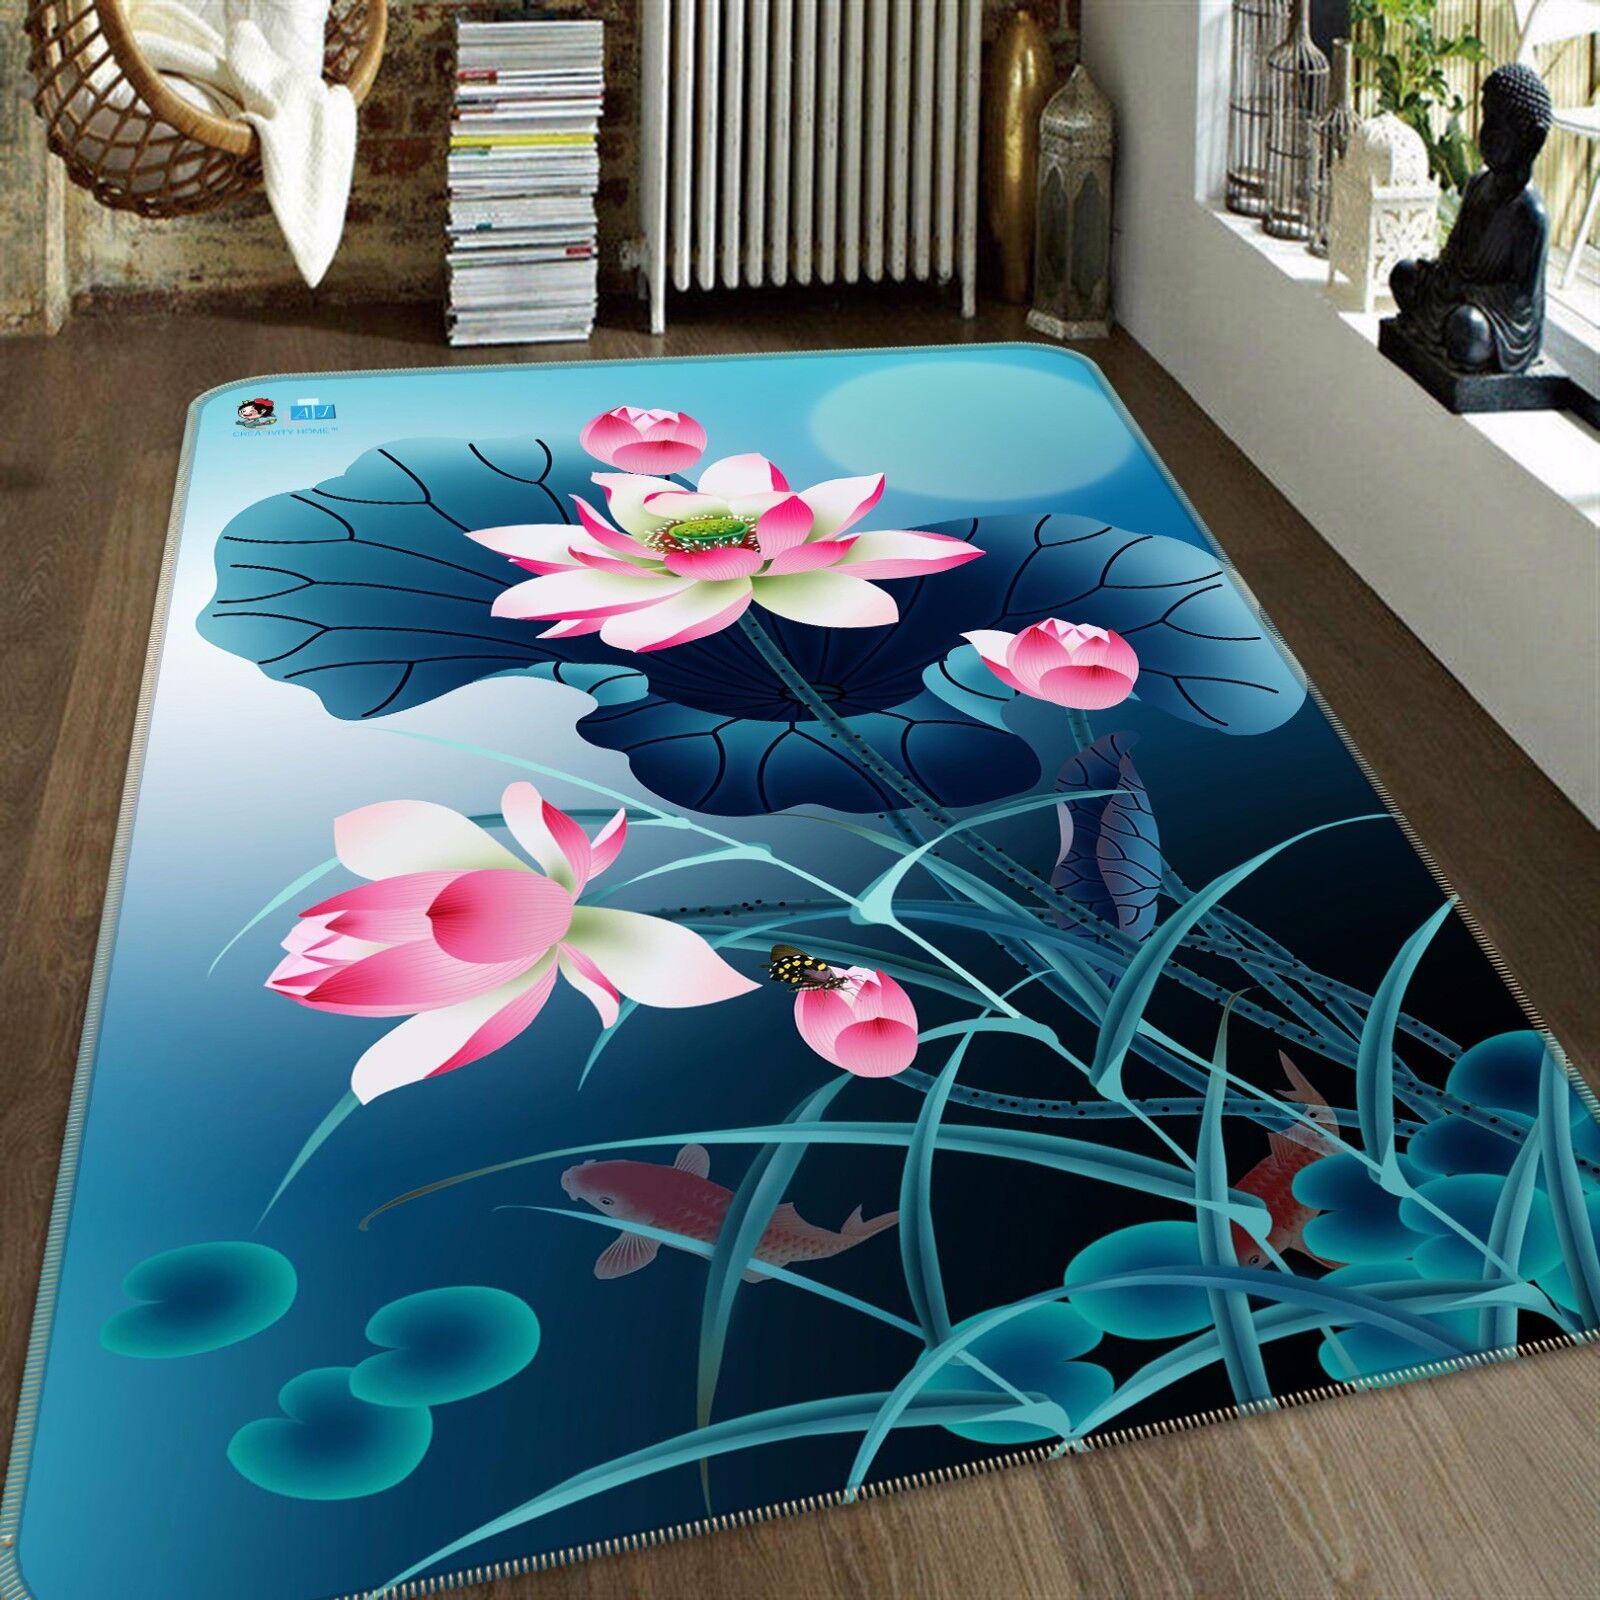 3D Lotus Bloom 467 tappetino antiscivolo tappeto camera Tappetino Qualità Elegante foto Tappeto UK